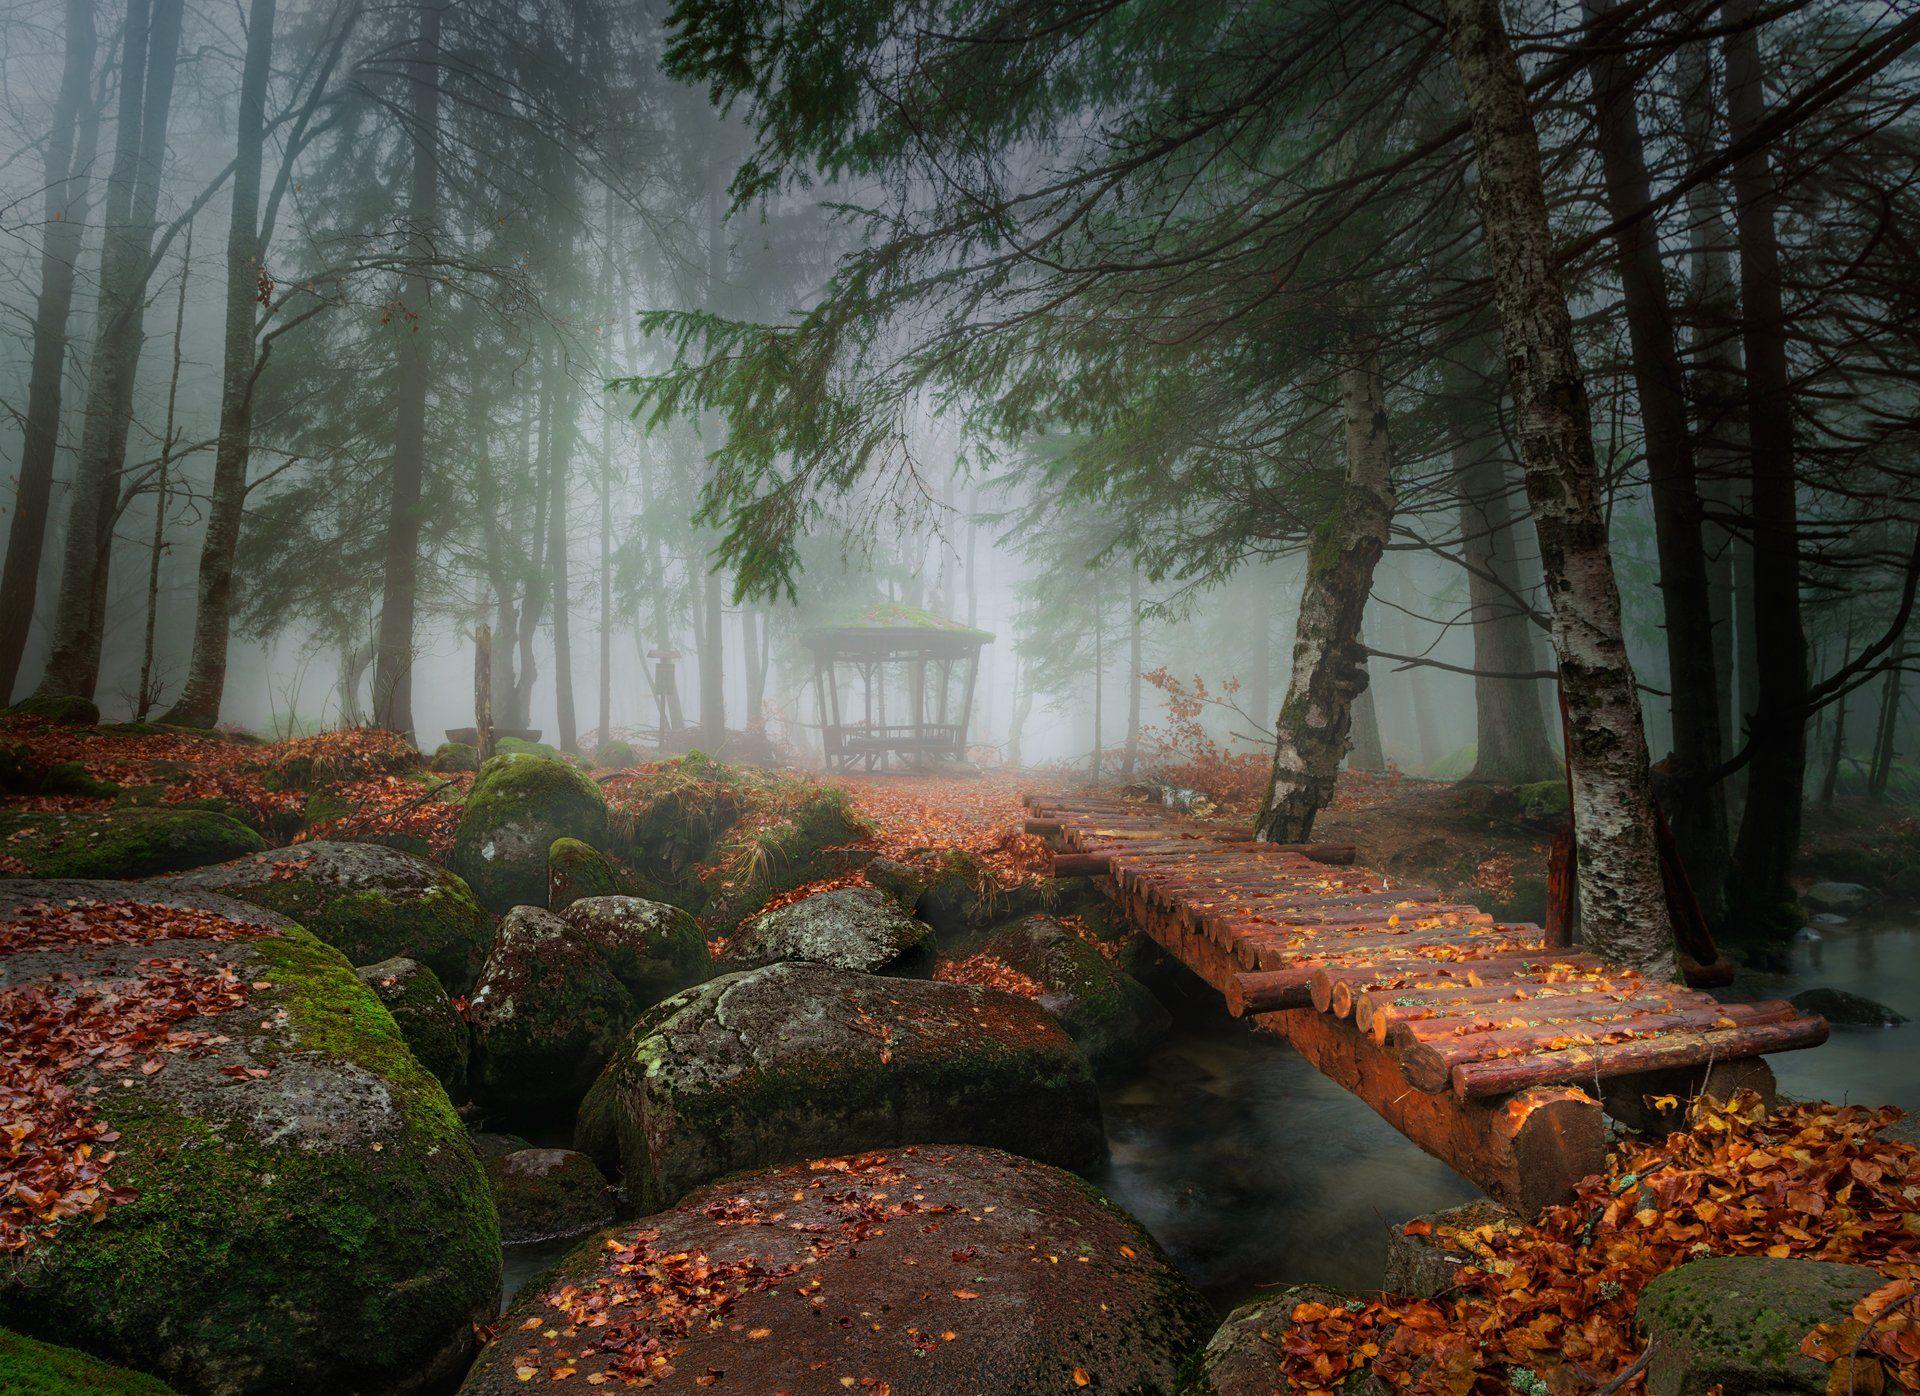 landscape nature autumn foggy scenery forest wood mountain vitosha bulgaria, Александър Александров